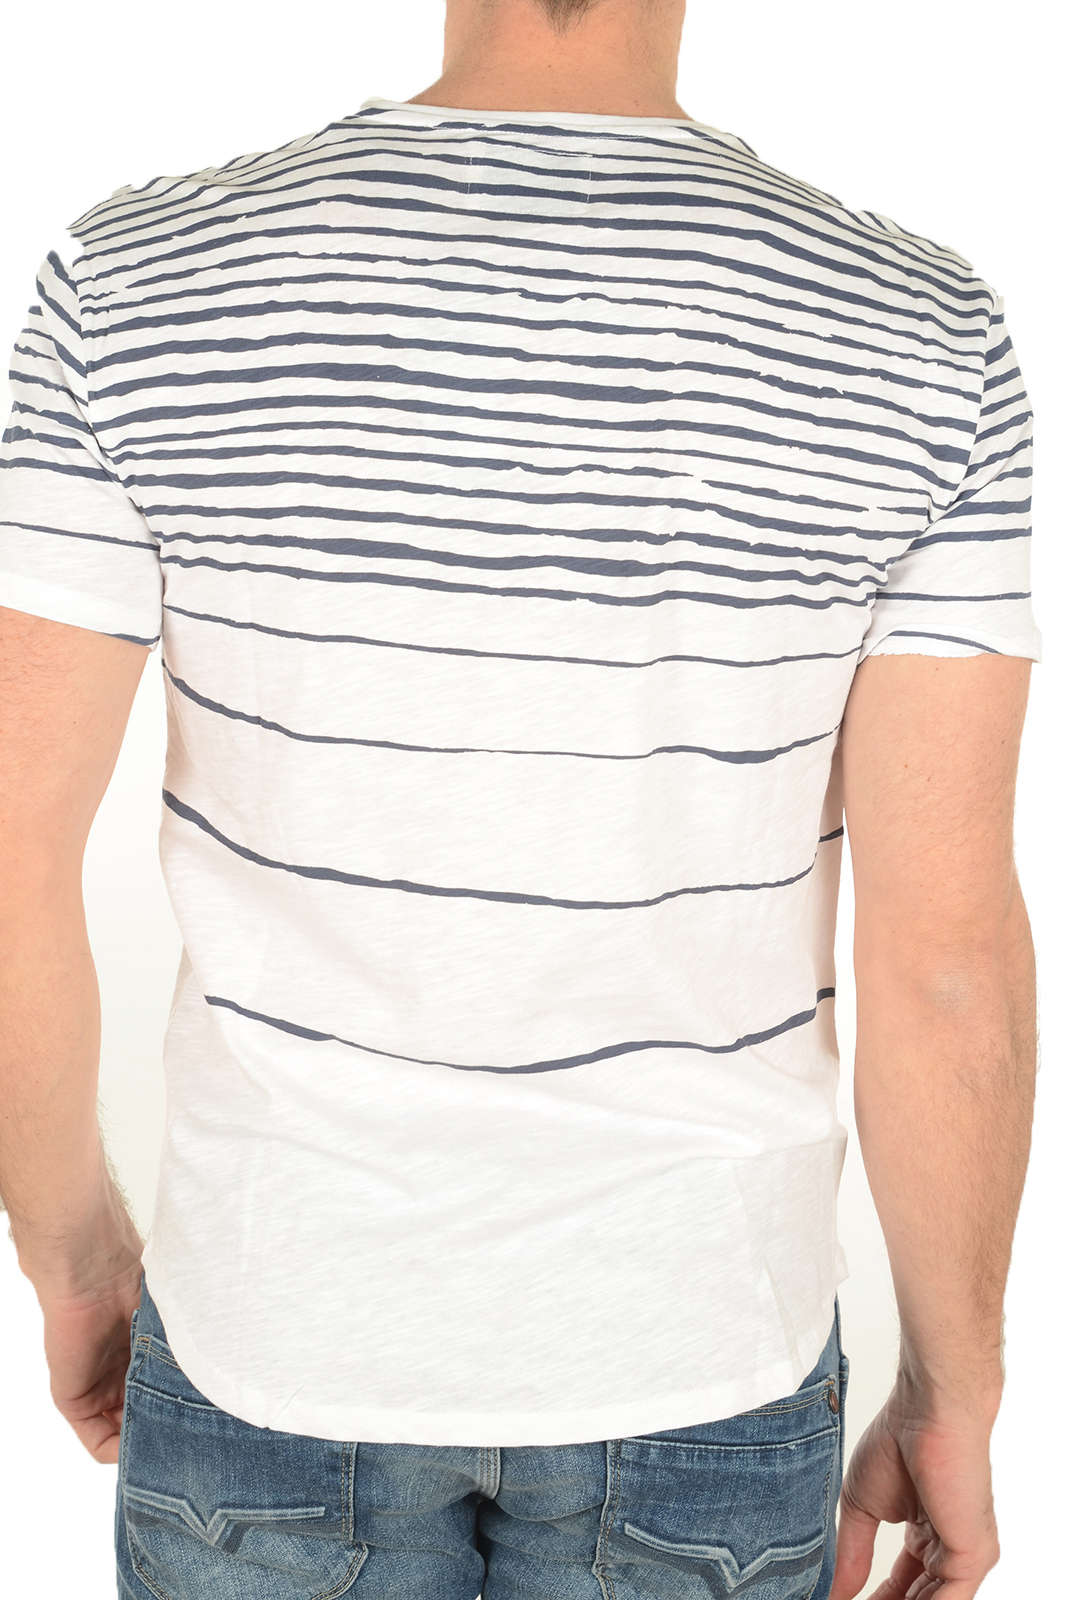 T-S manches courtes  Guess jeans M72P27 K4YI0 A716 BLANC BLEU